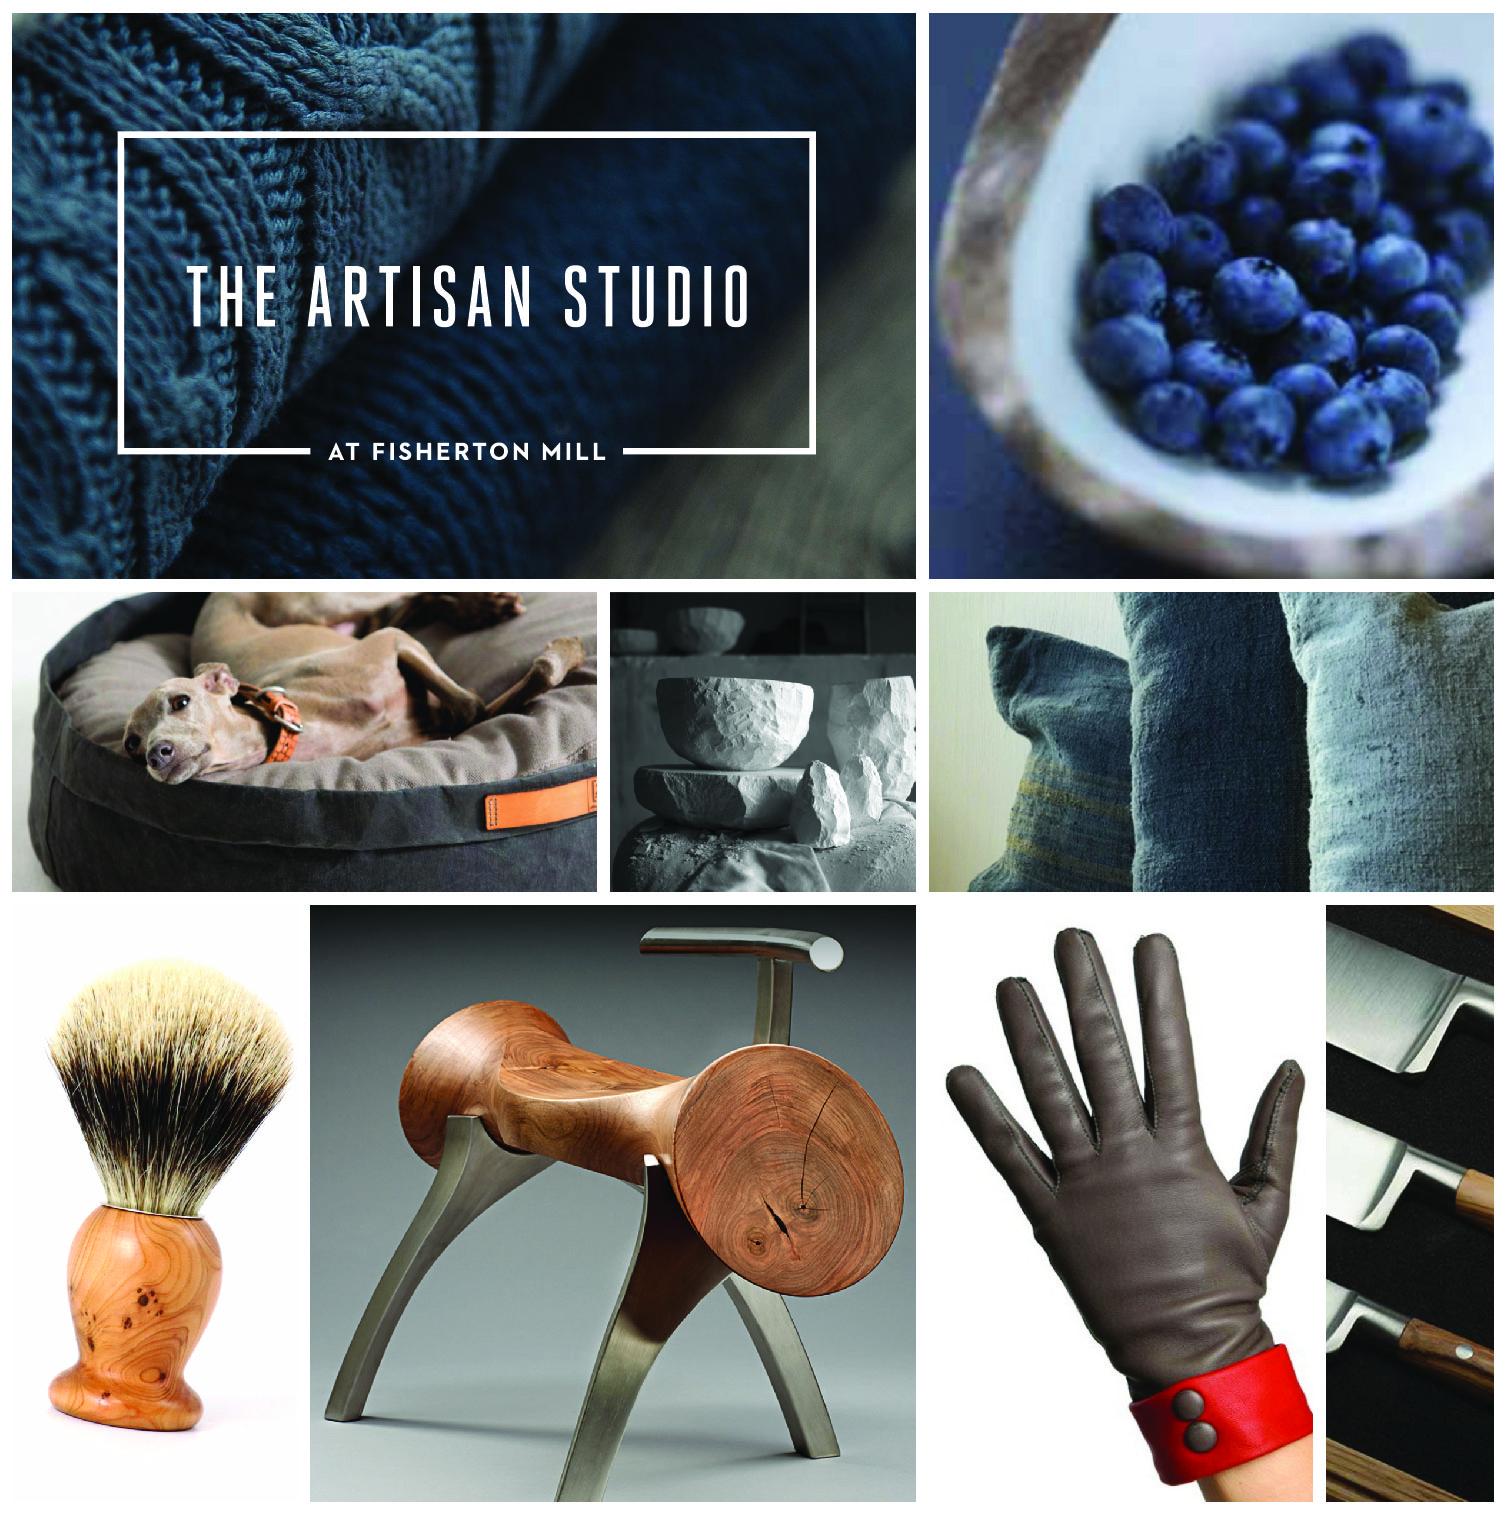 The Artisan Studio